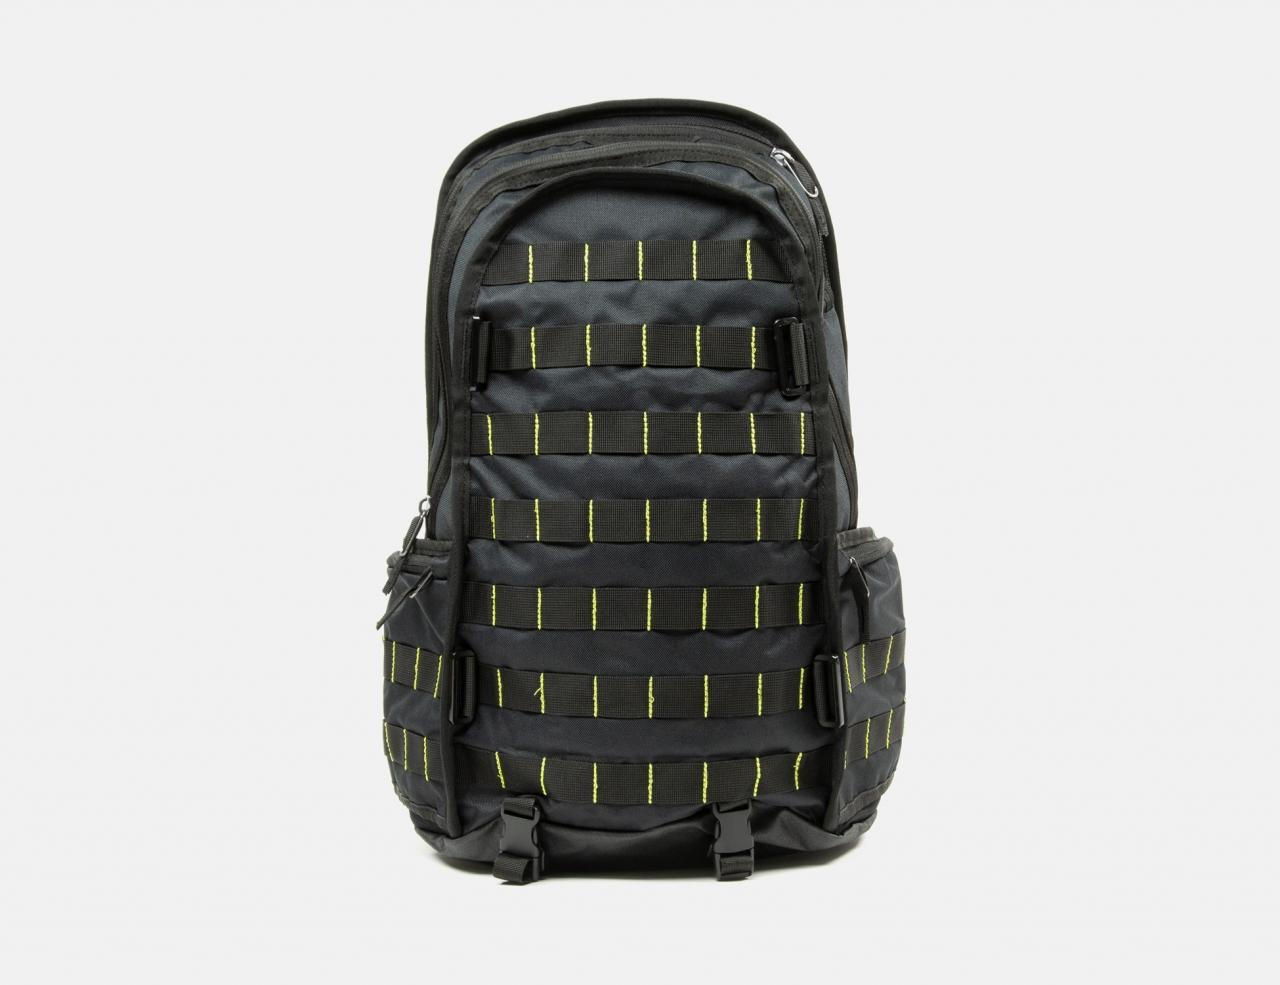 Nike SB RPM Rucksack - Black / Black / Cyber